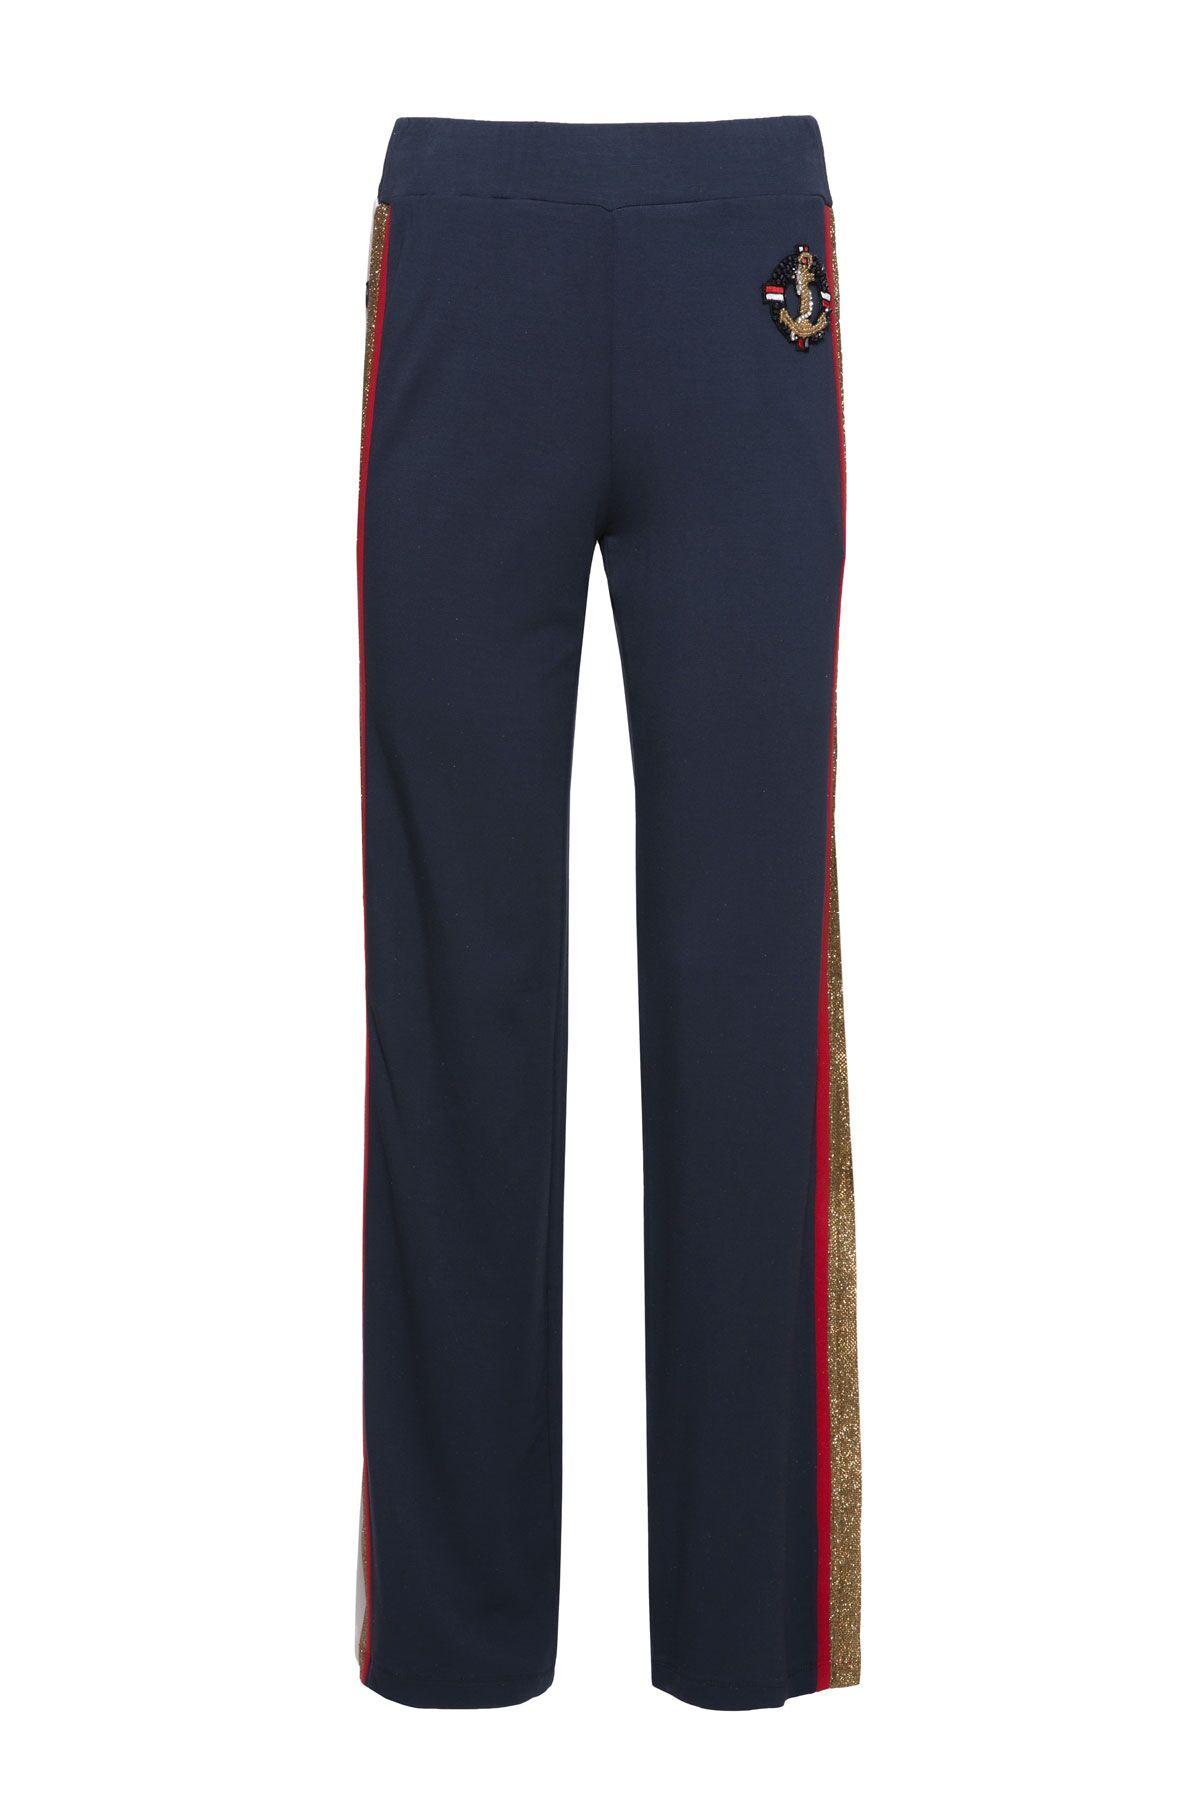 Şerit Detaylı Geniş Paça Lacivert Spor Pantolon